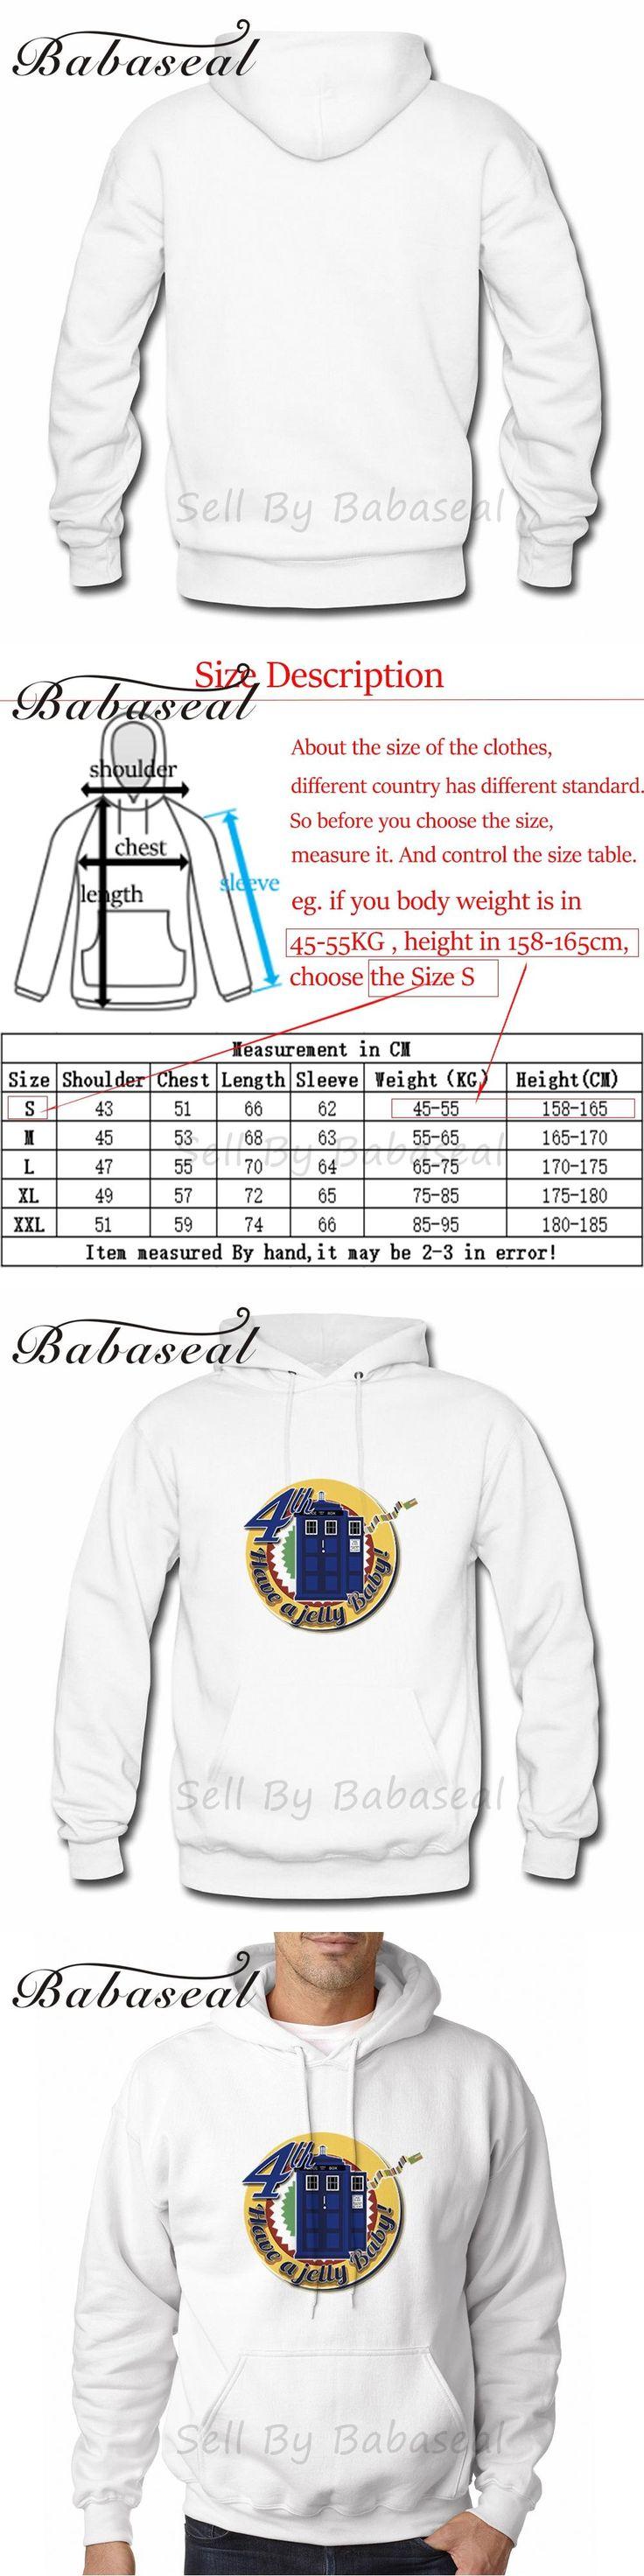 Babaseal Have A Jelly Baby 3d Printer Hip Hop Hoodies Men Japanese Anime Camo Sweatshirt Skate Clothes Men Joker Hoodie